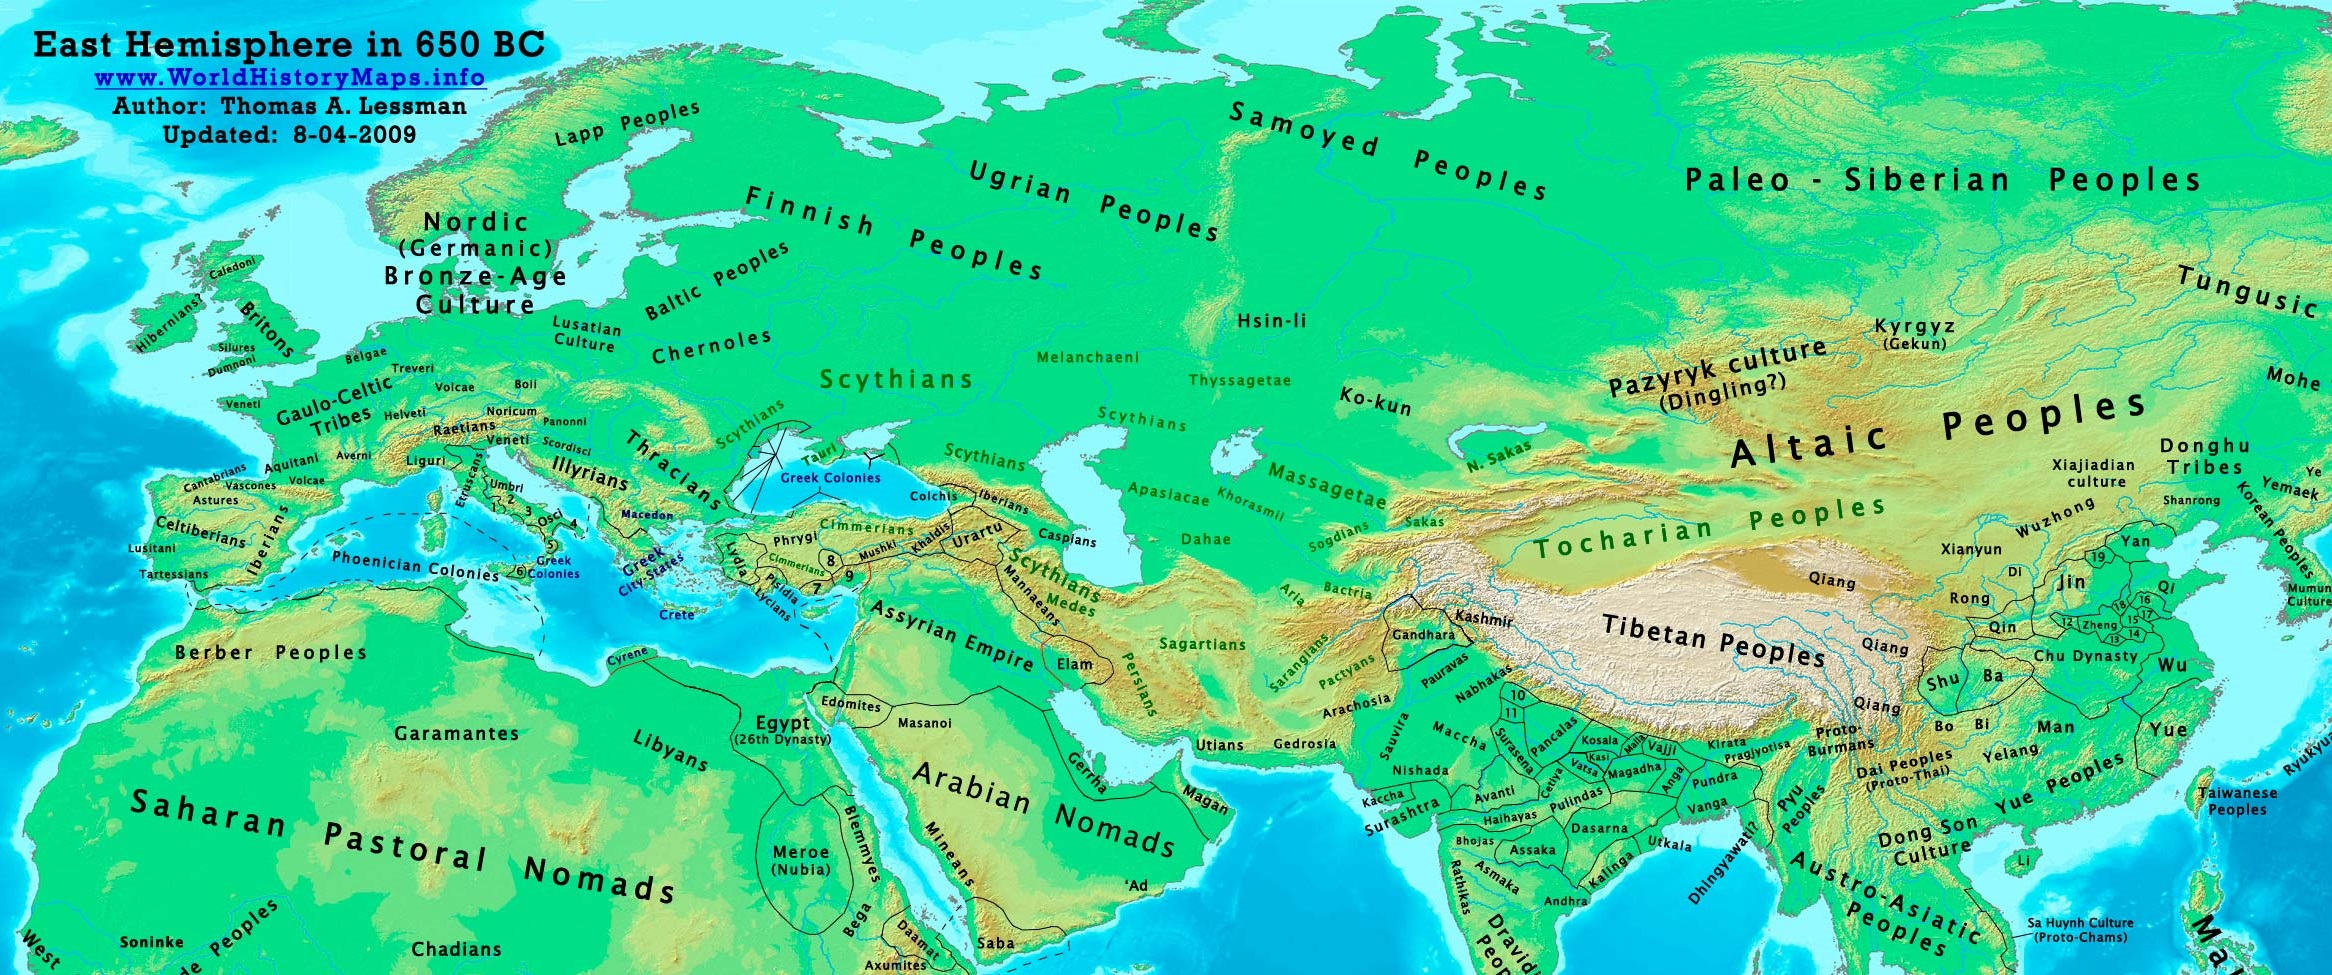 650 BC